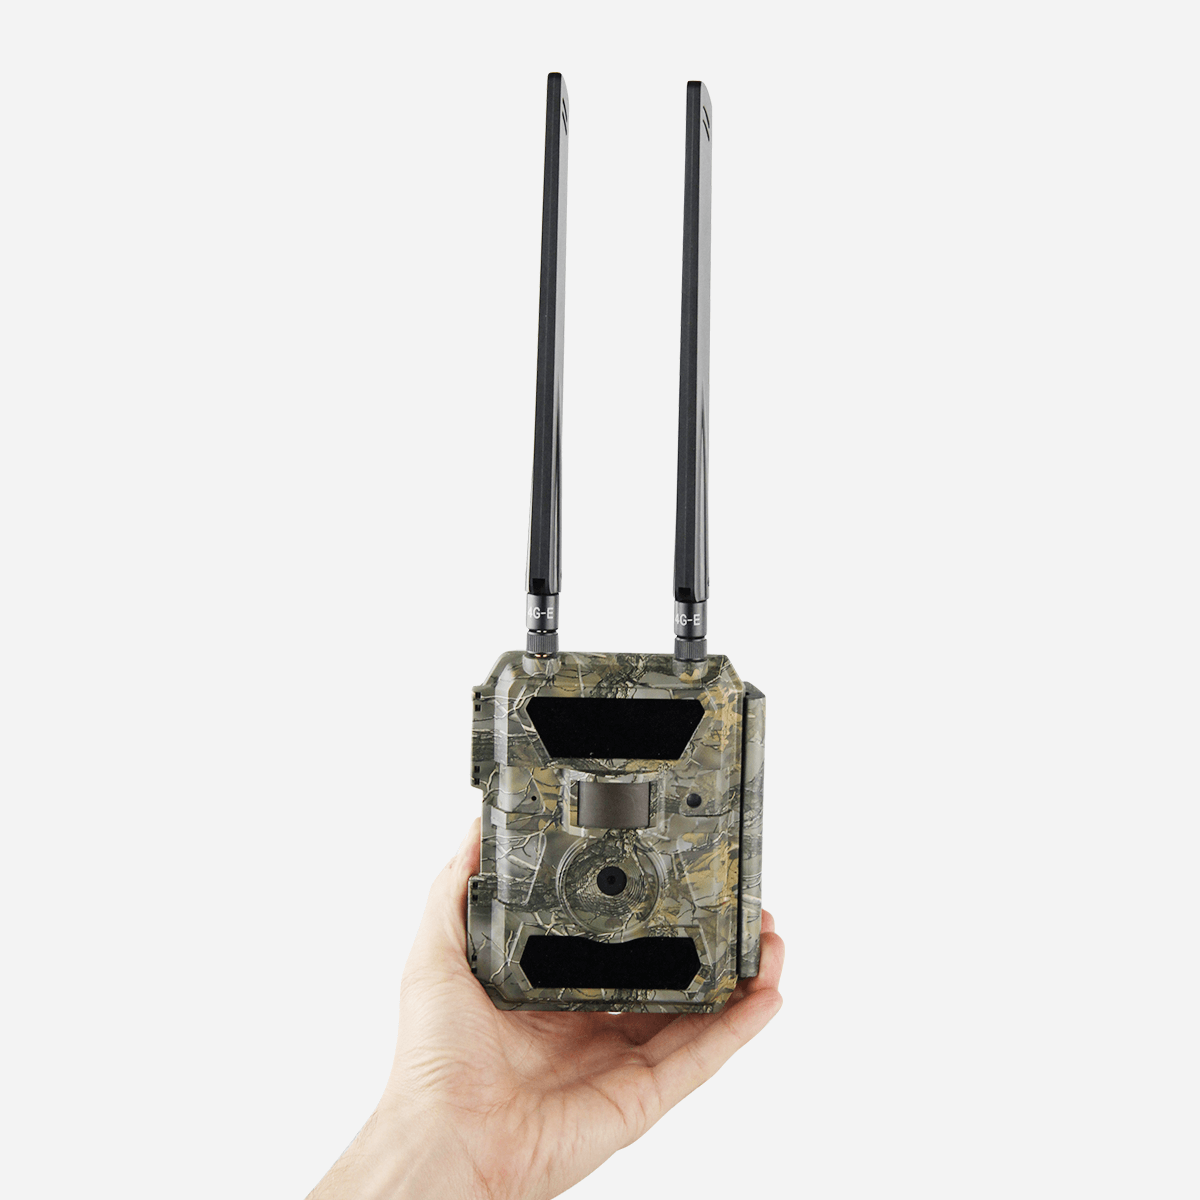 kamery monitoring przewodowy Orllo.pl